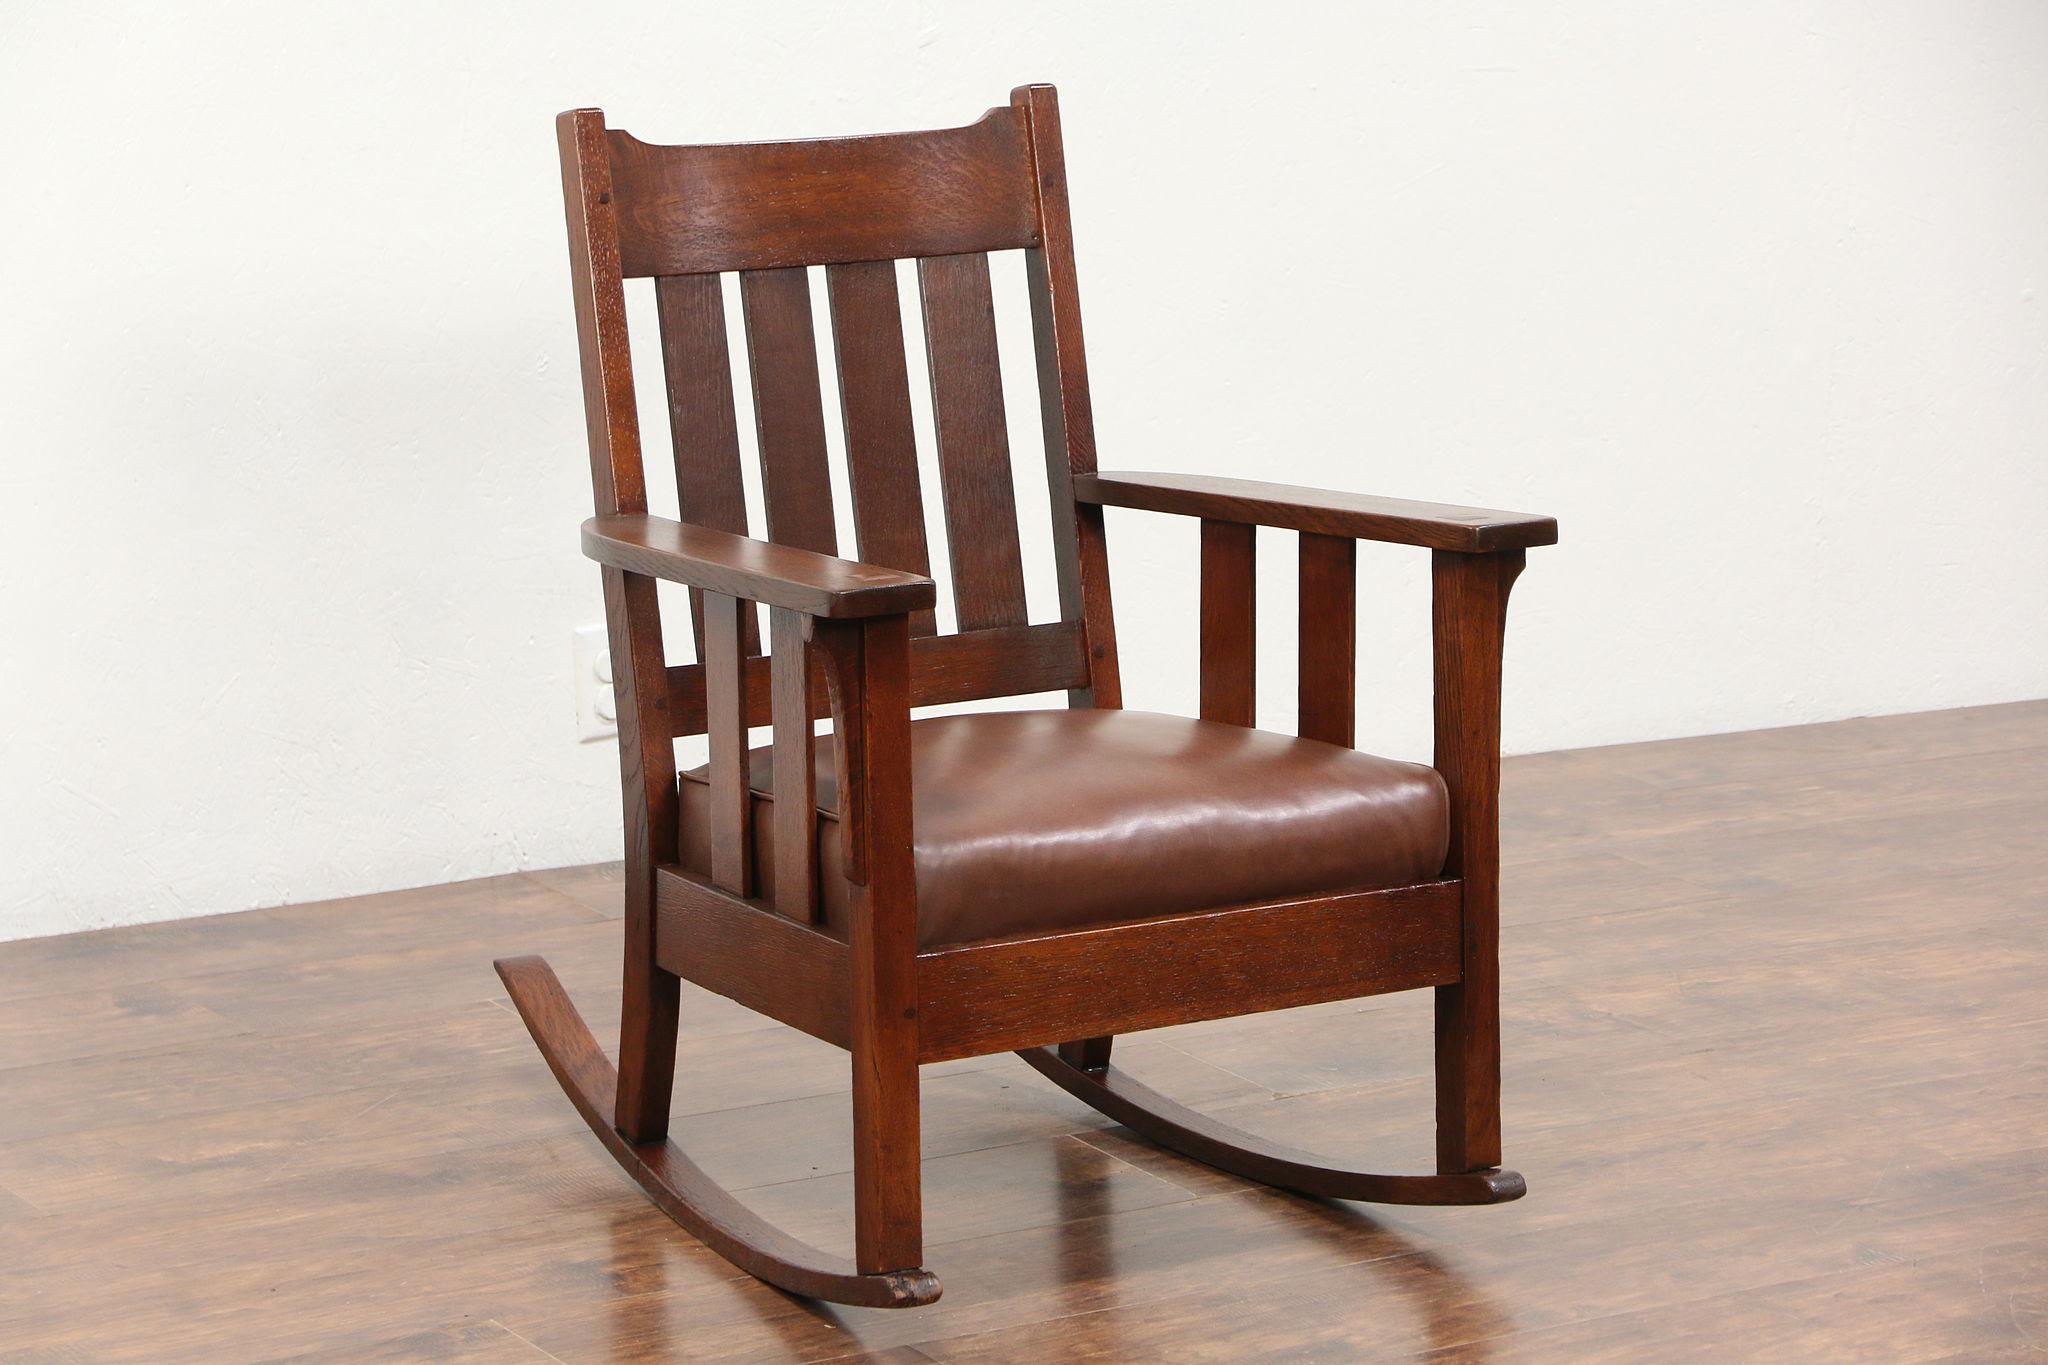 Genial Arts U0026 Crafts Mission Oak Rocker, 1905 Antique Craftsman Rocking Chair